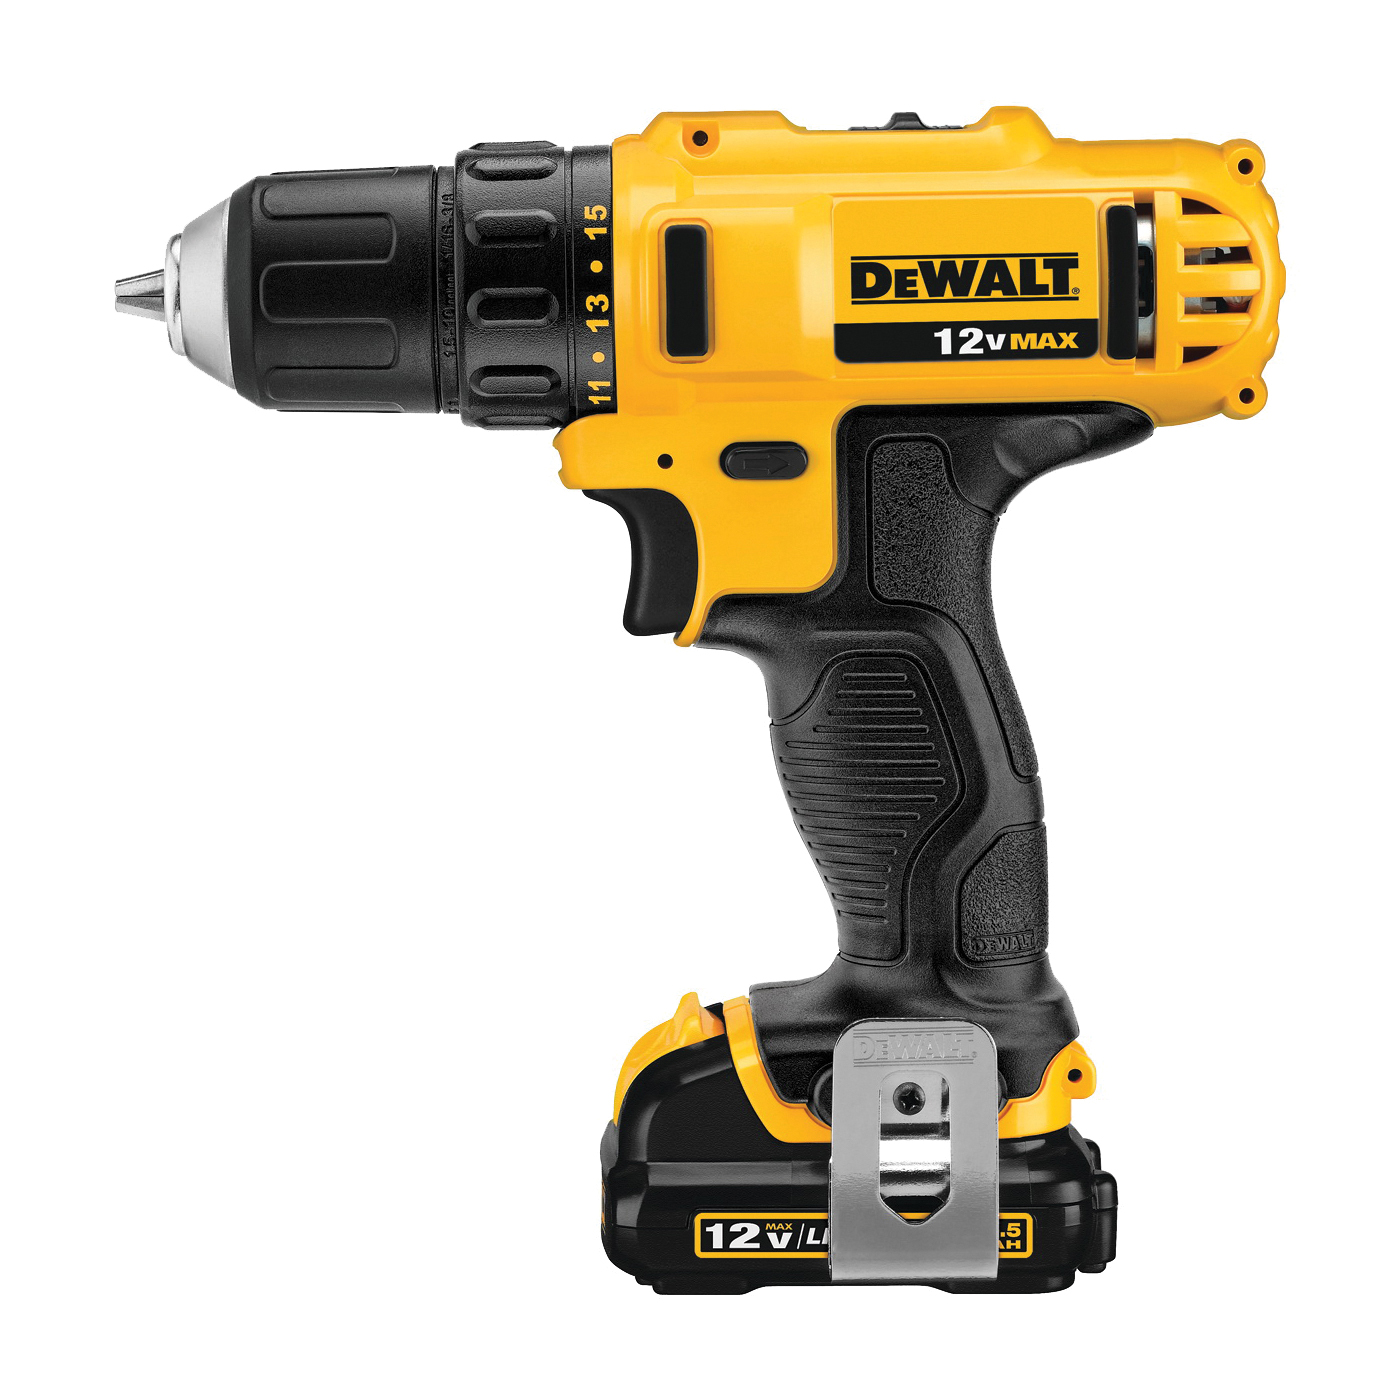 Picture of DeWALT DCD710S2 Drill/Driver Kit, Kit, 12 V Battery, 3/8 in Chuck, Keyless, Single Sleeve Chuck